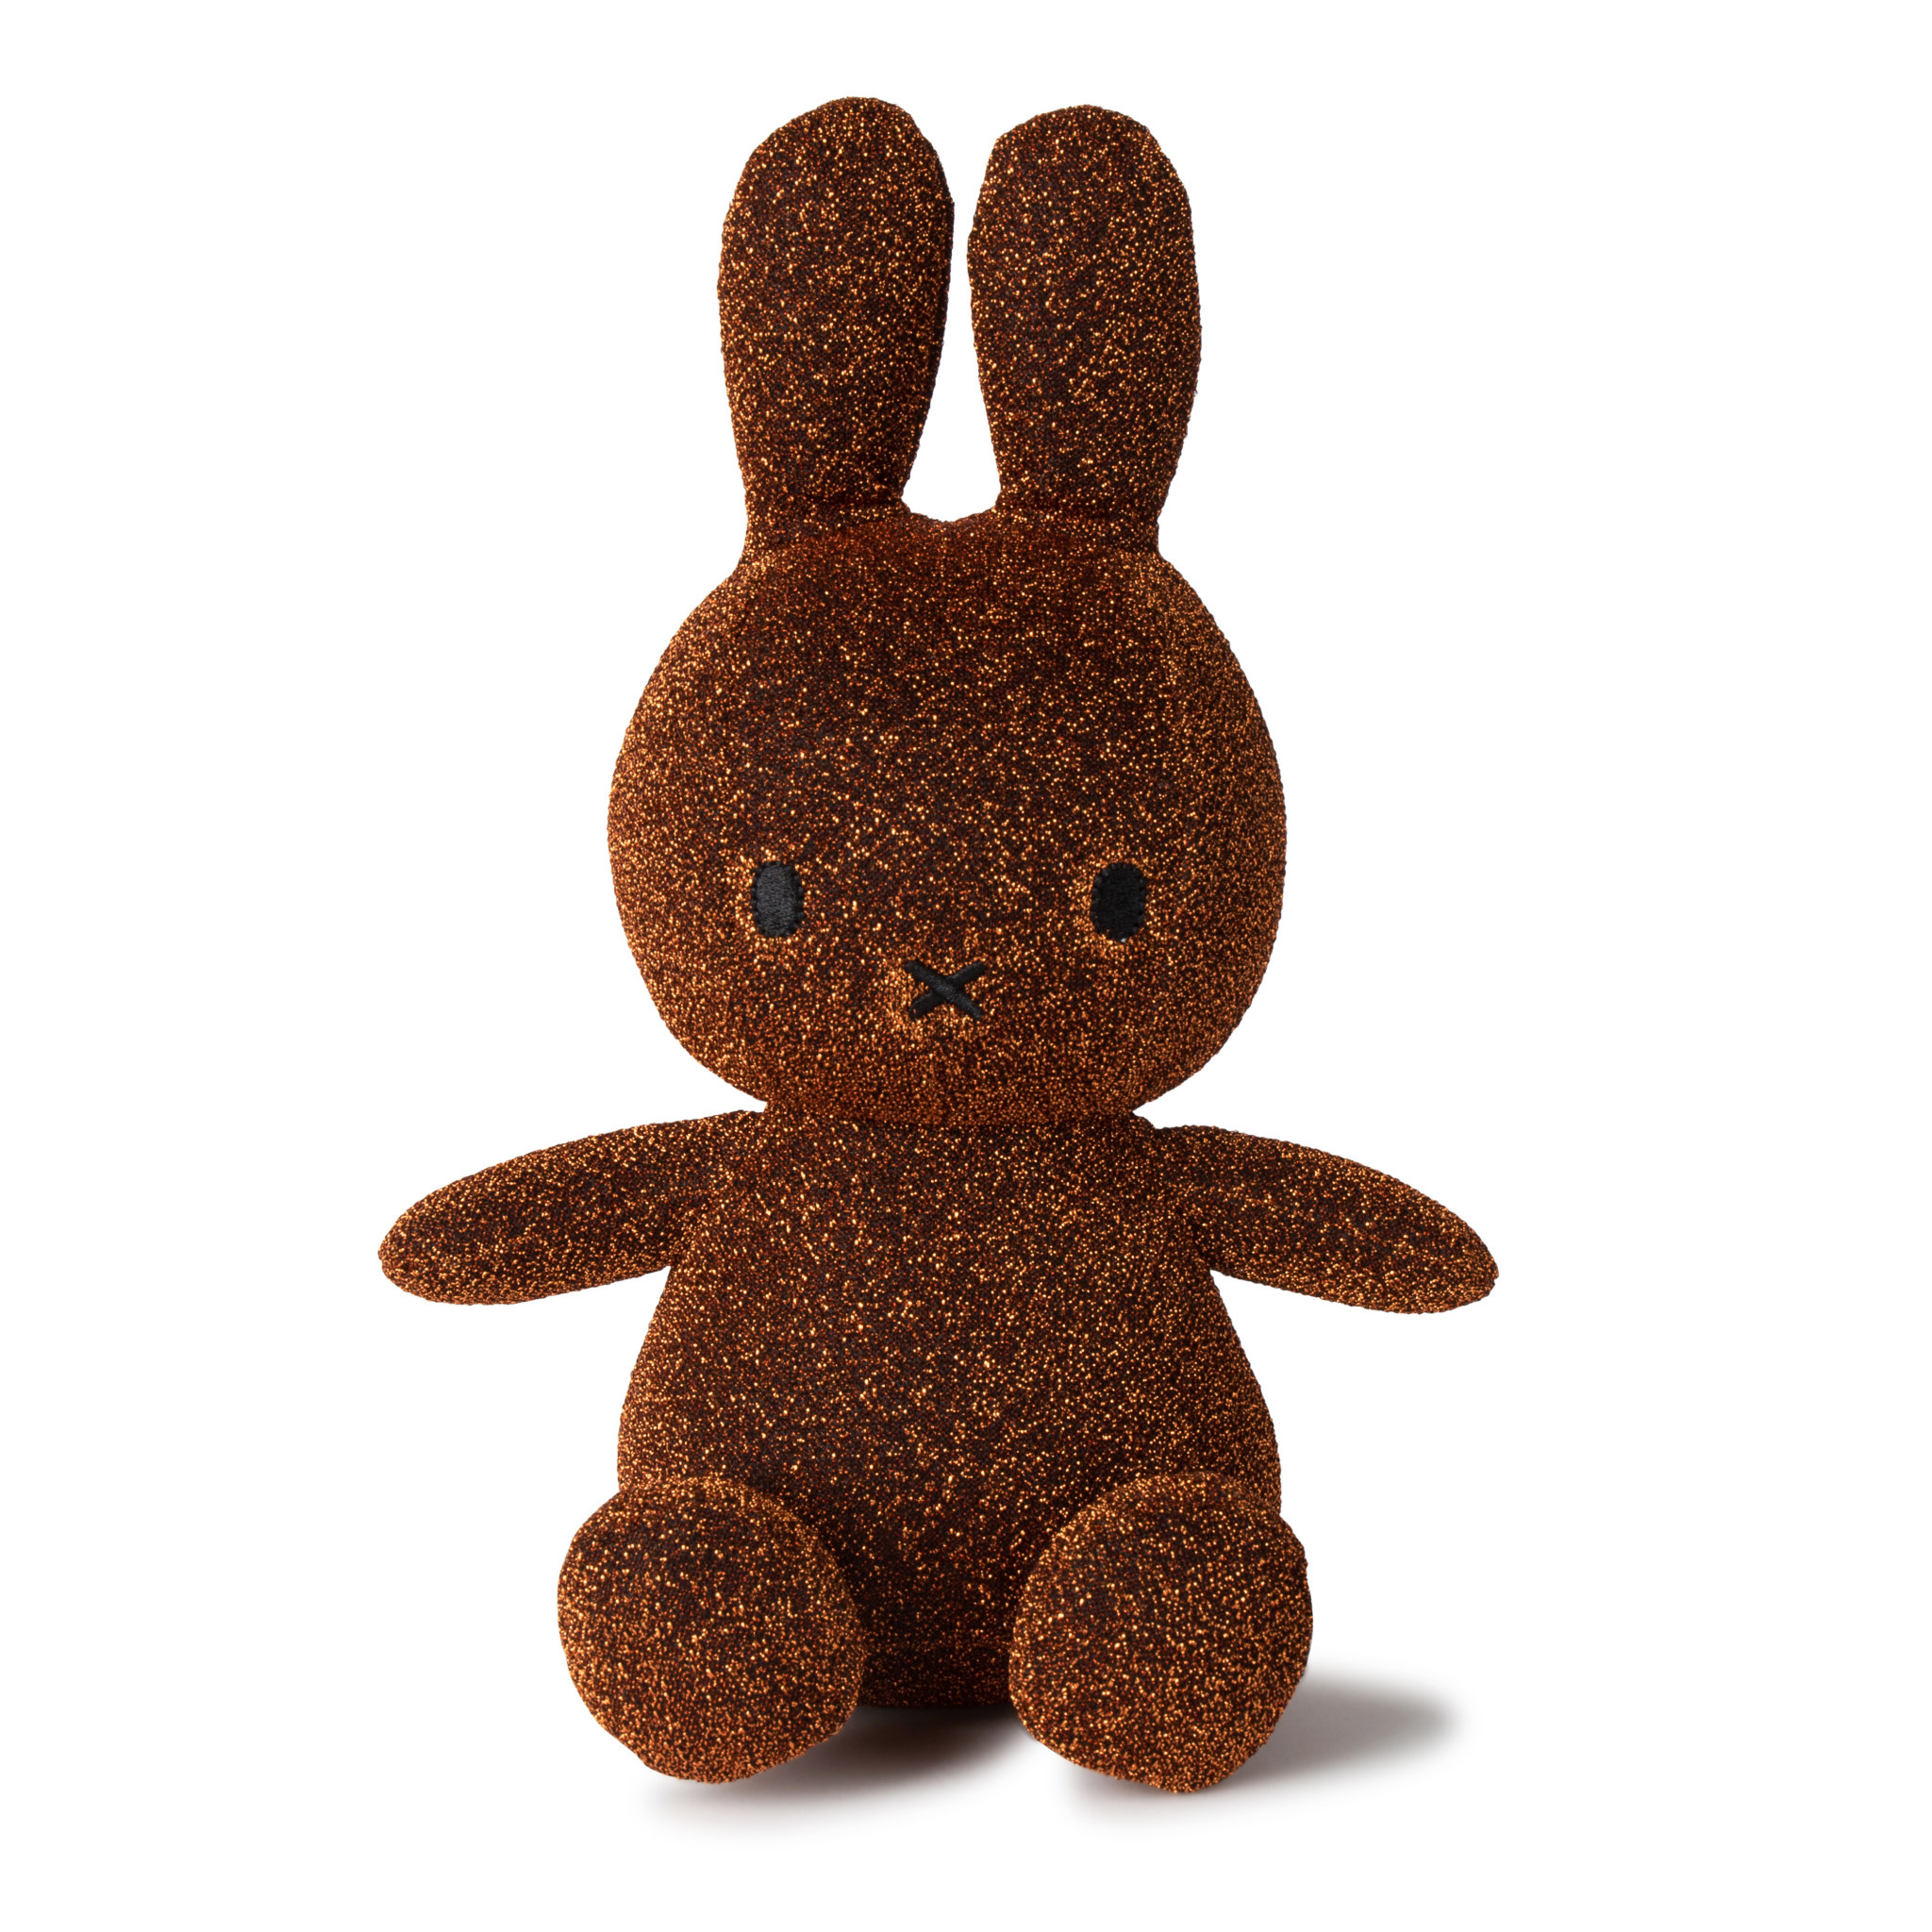 "Nijntje/Miffy/Snuffy Miffy Sitting Sparkle Copper- 23 cm - 9"" Limited Edition"